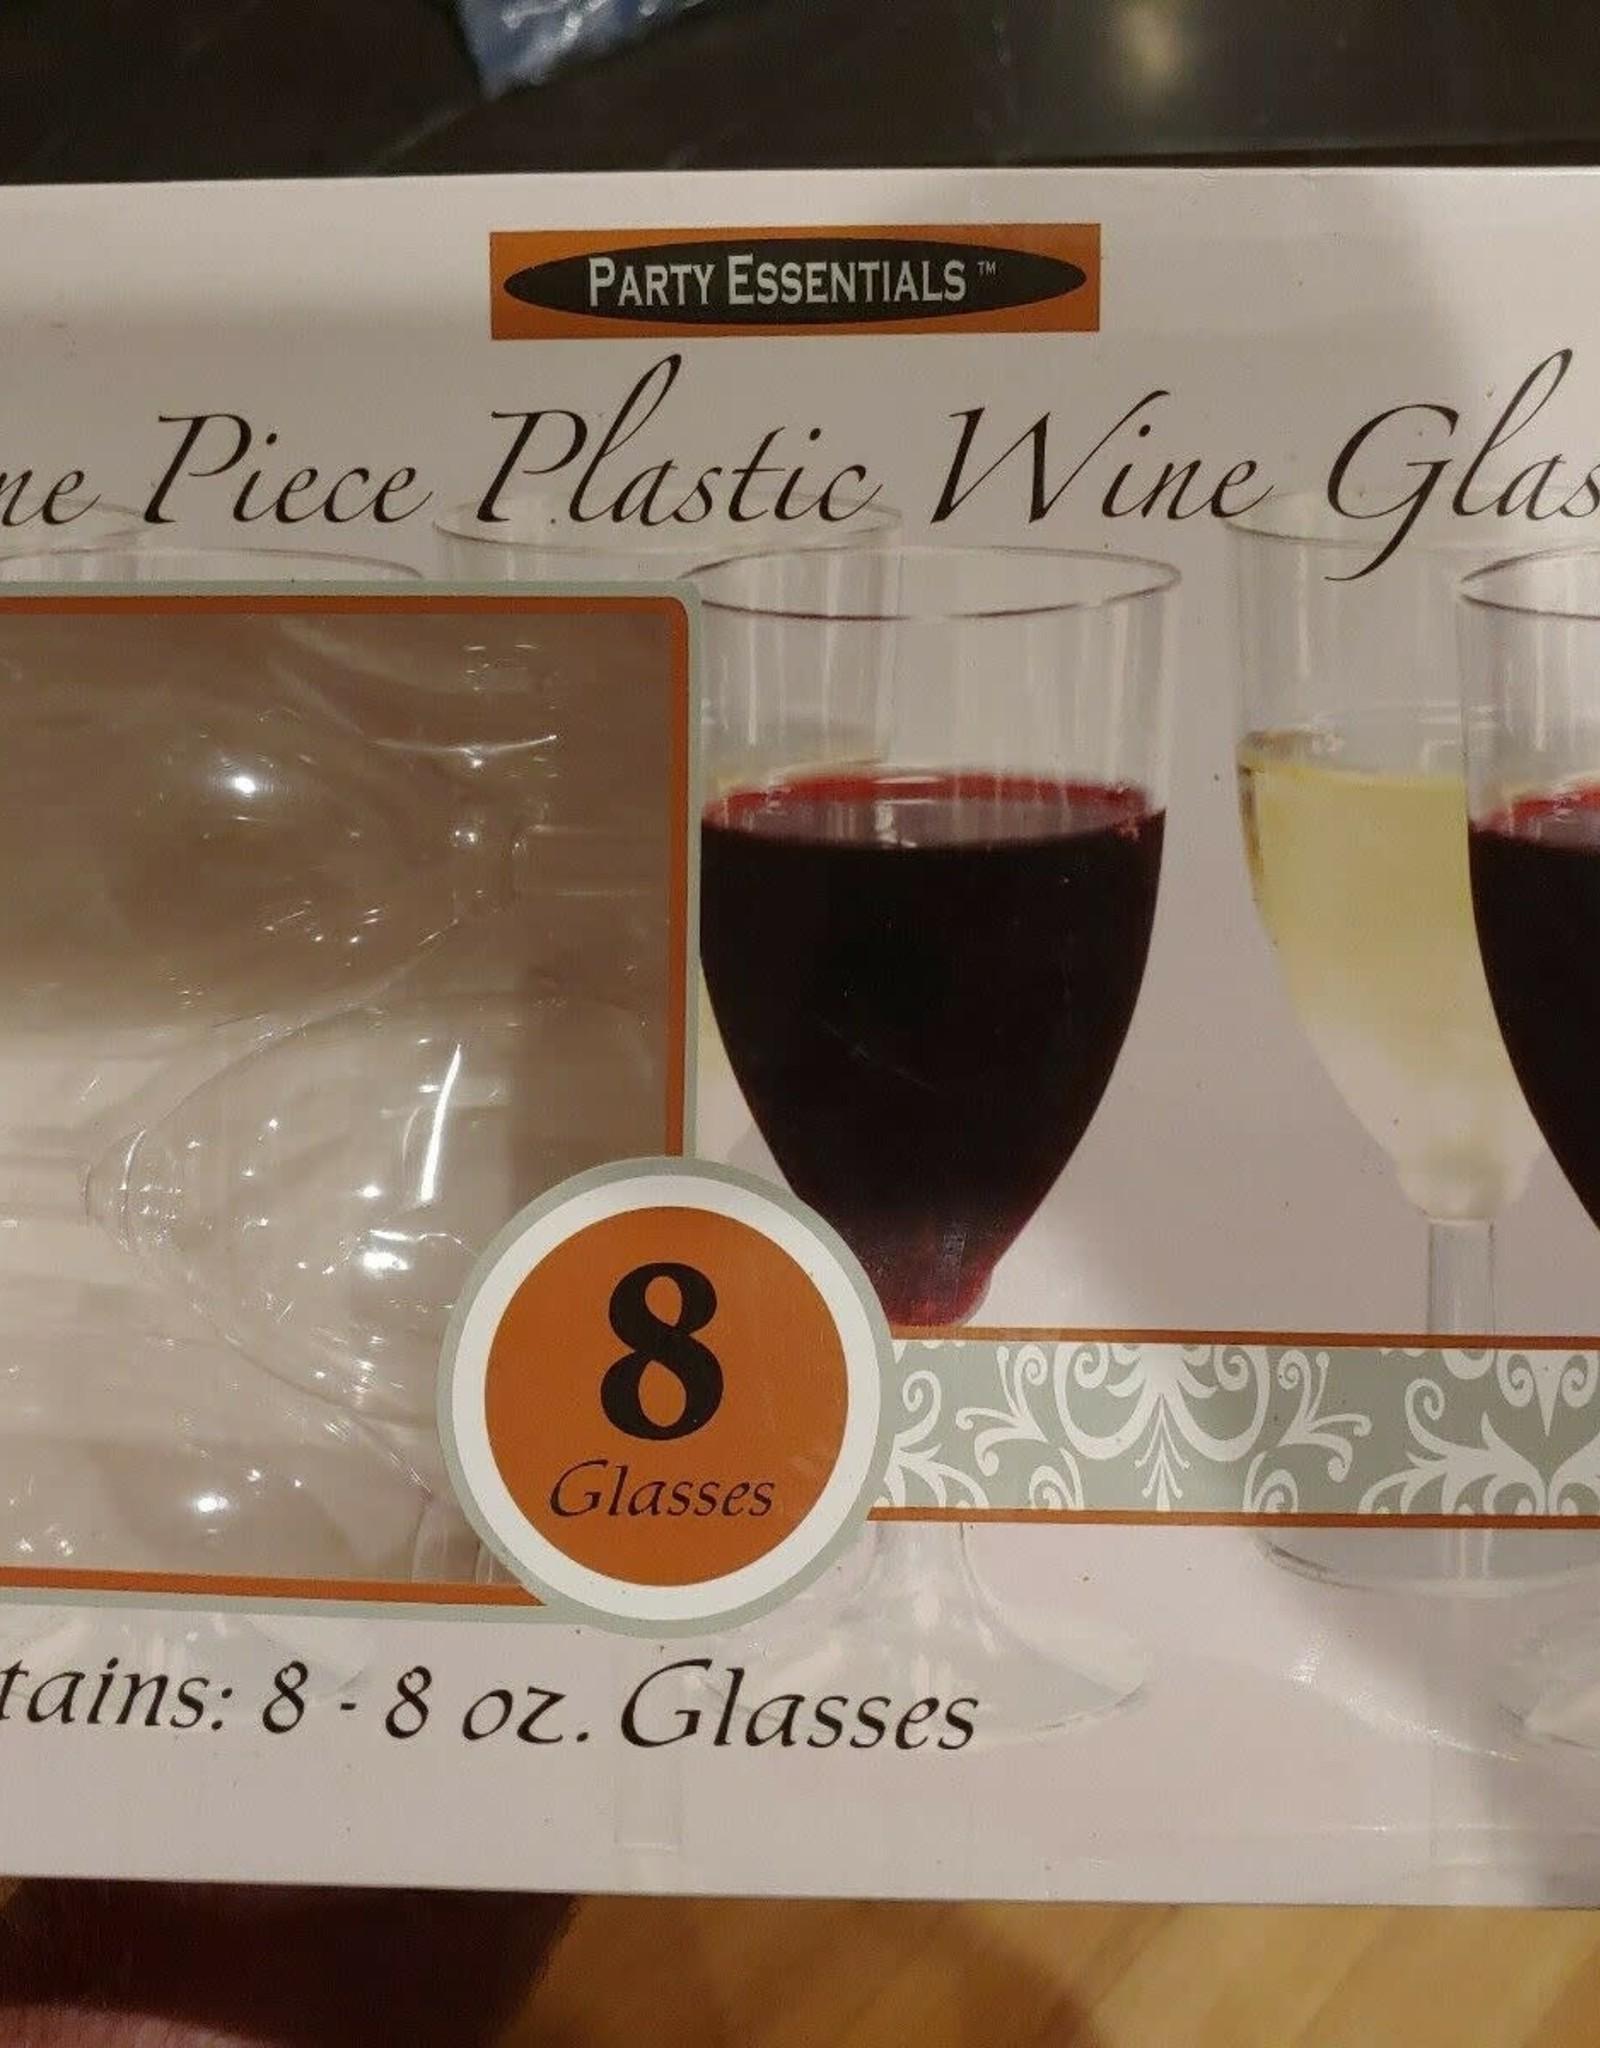 One piece plastic wine glasses